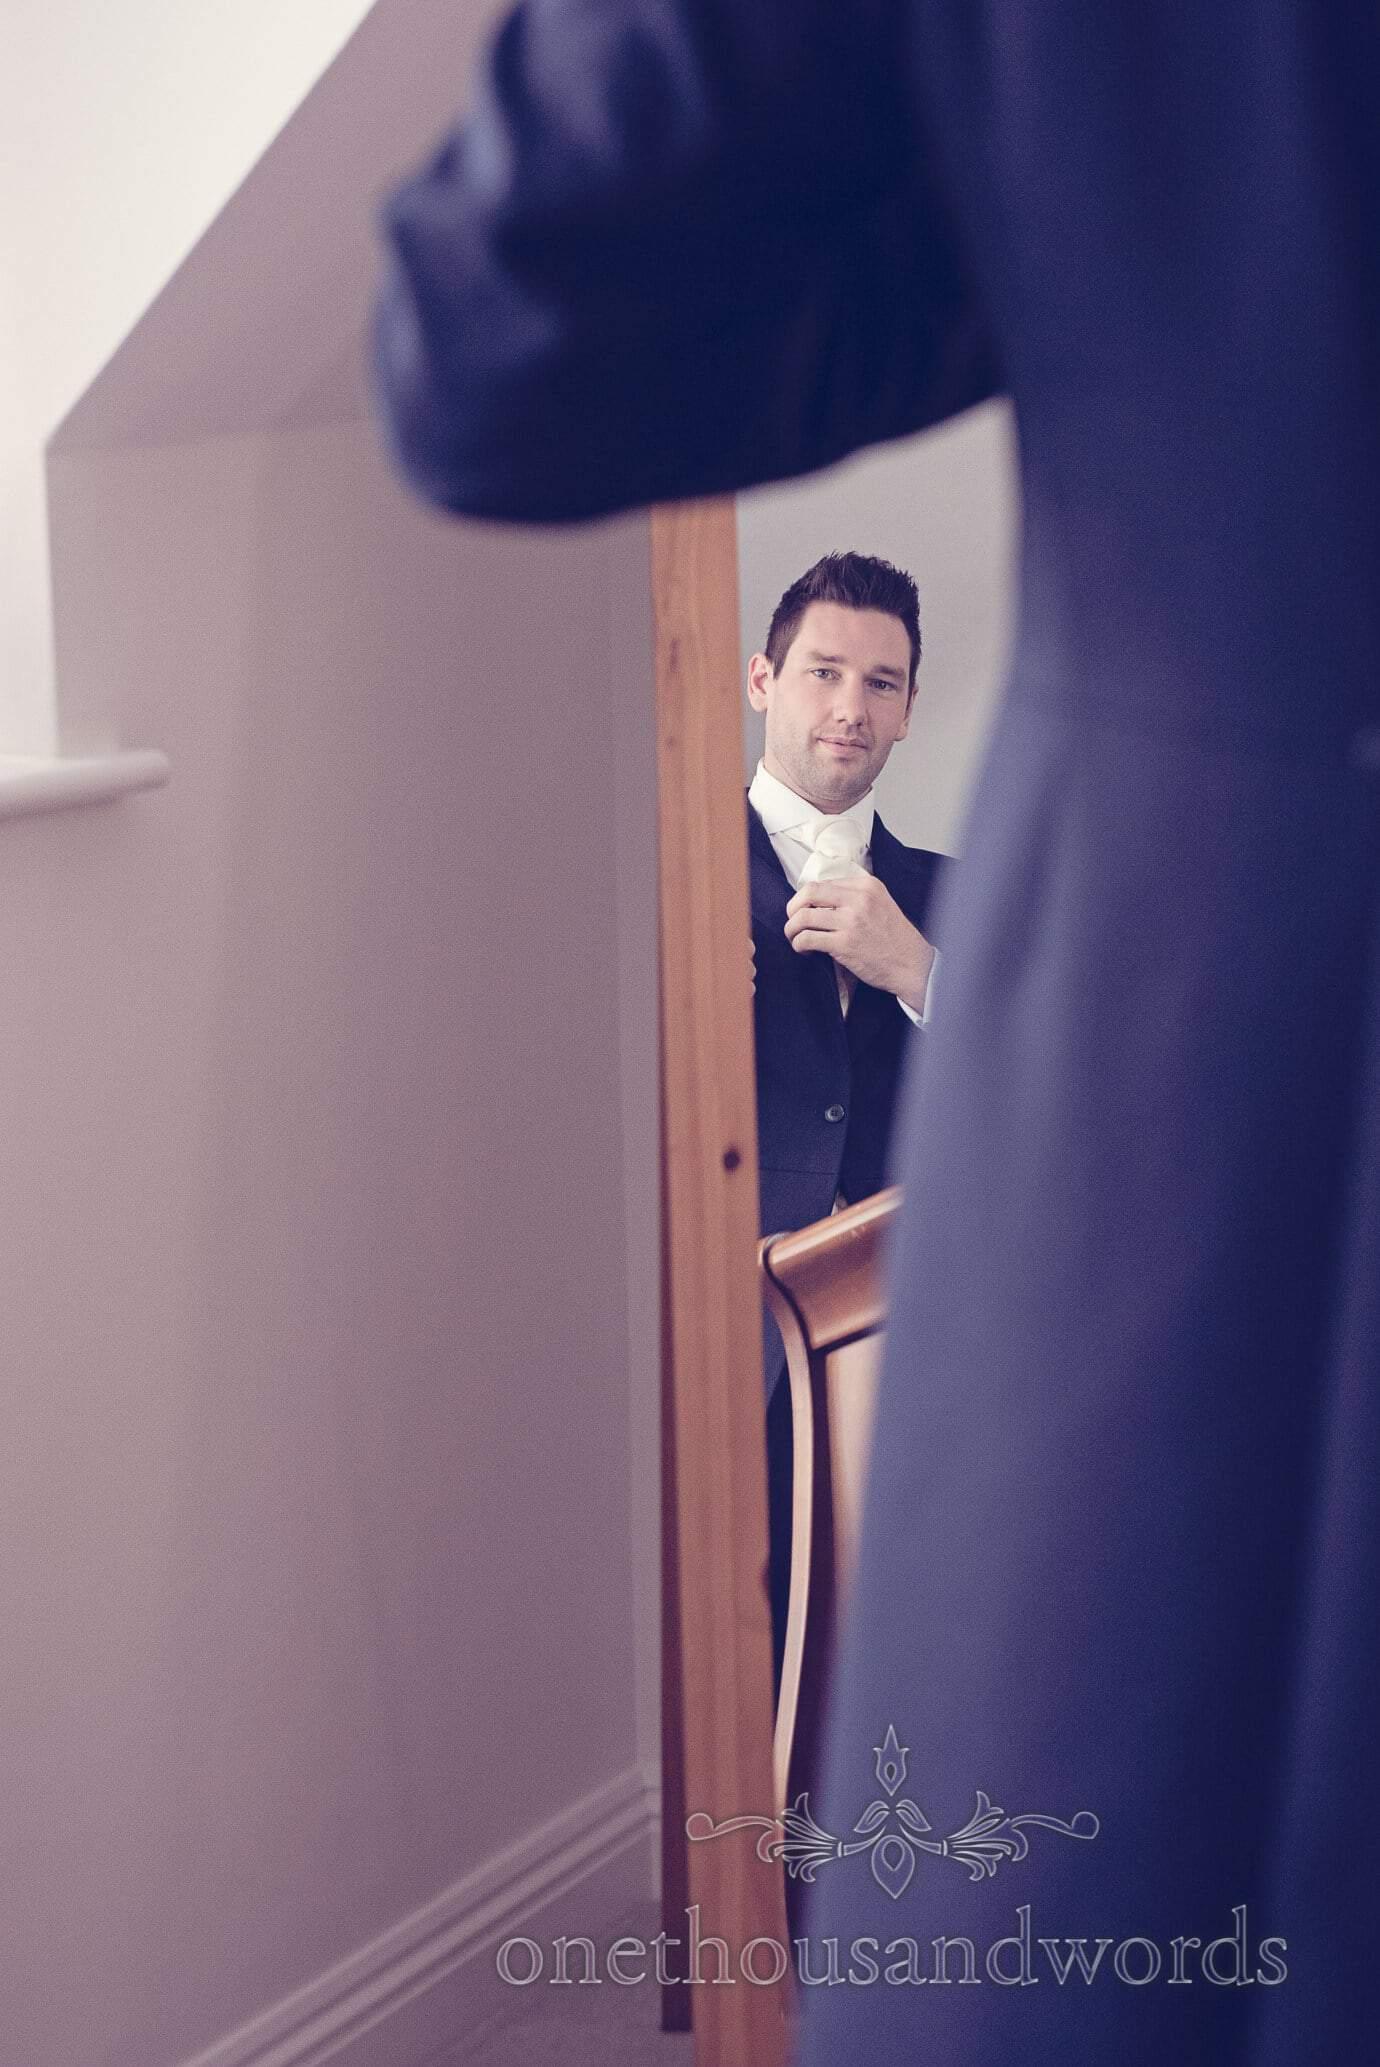 Groom adjusts cravatte in mirror on wedding morning